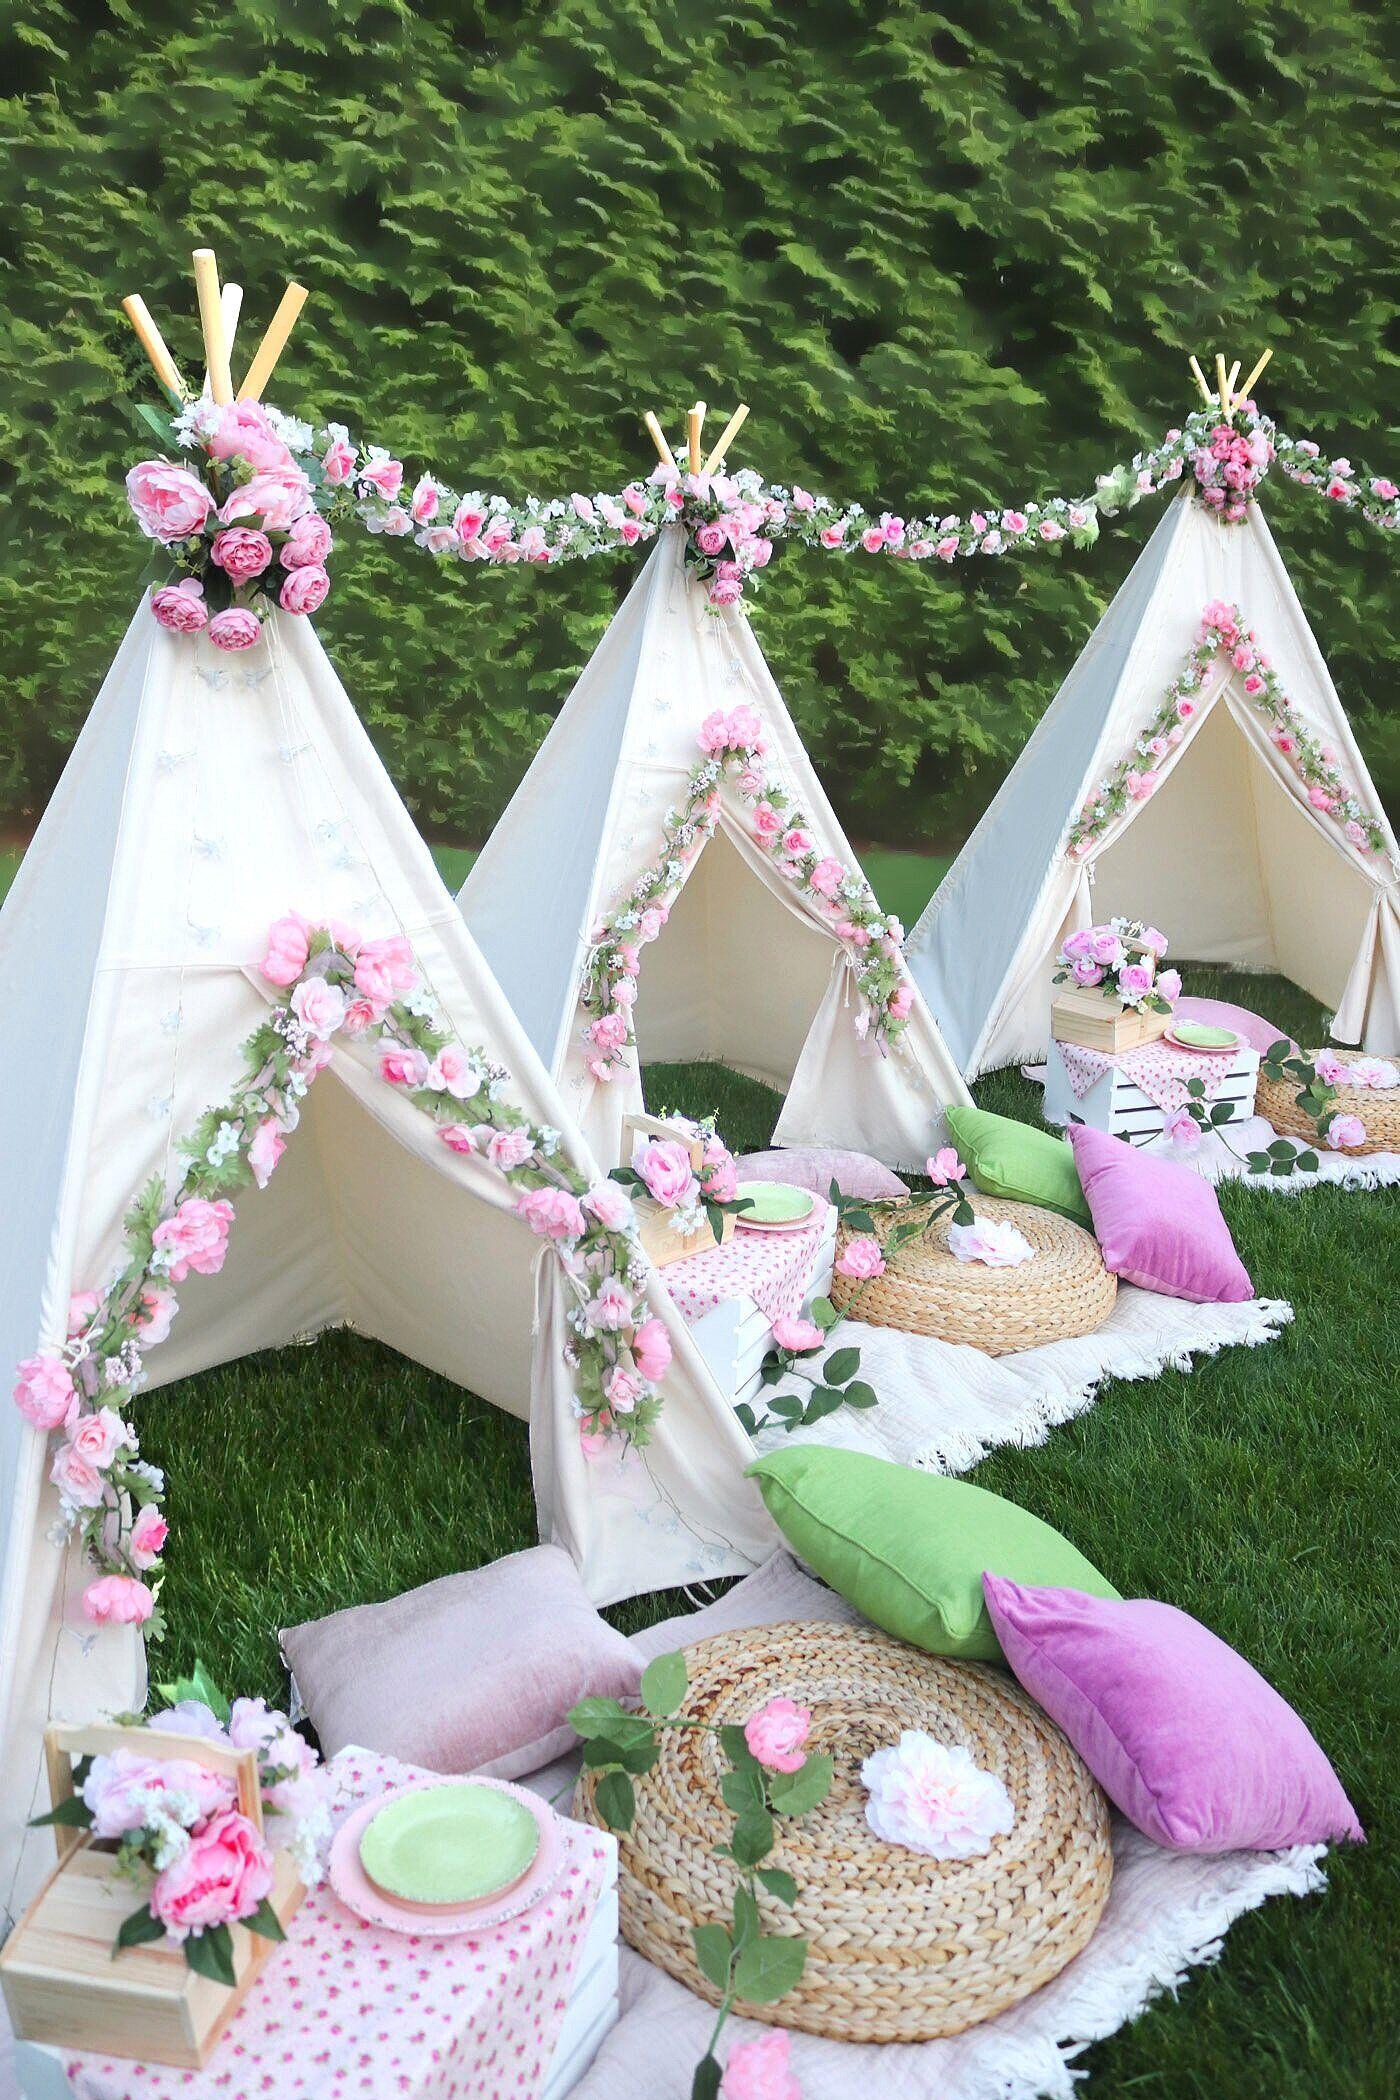 Outdoor Picnic Party Rentals - Decor & Props - Kids ...